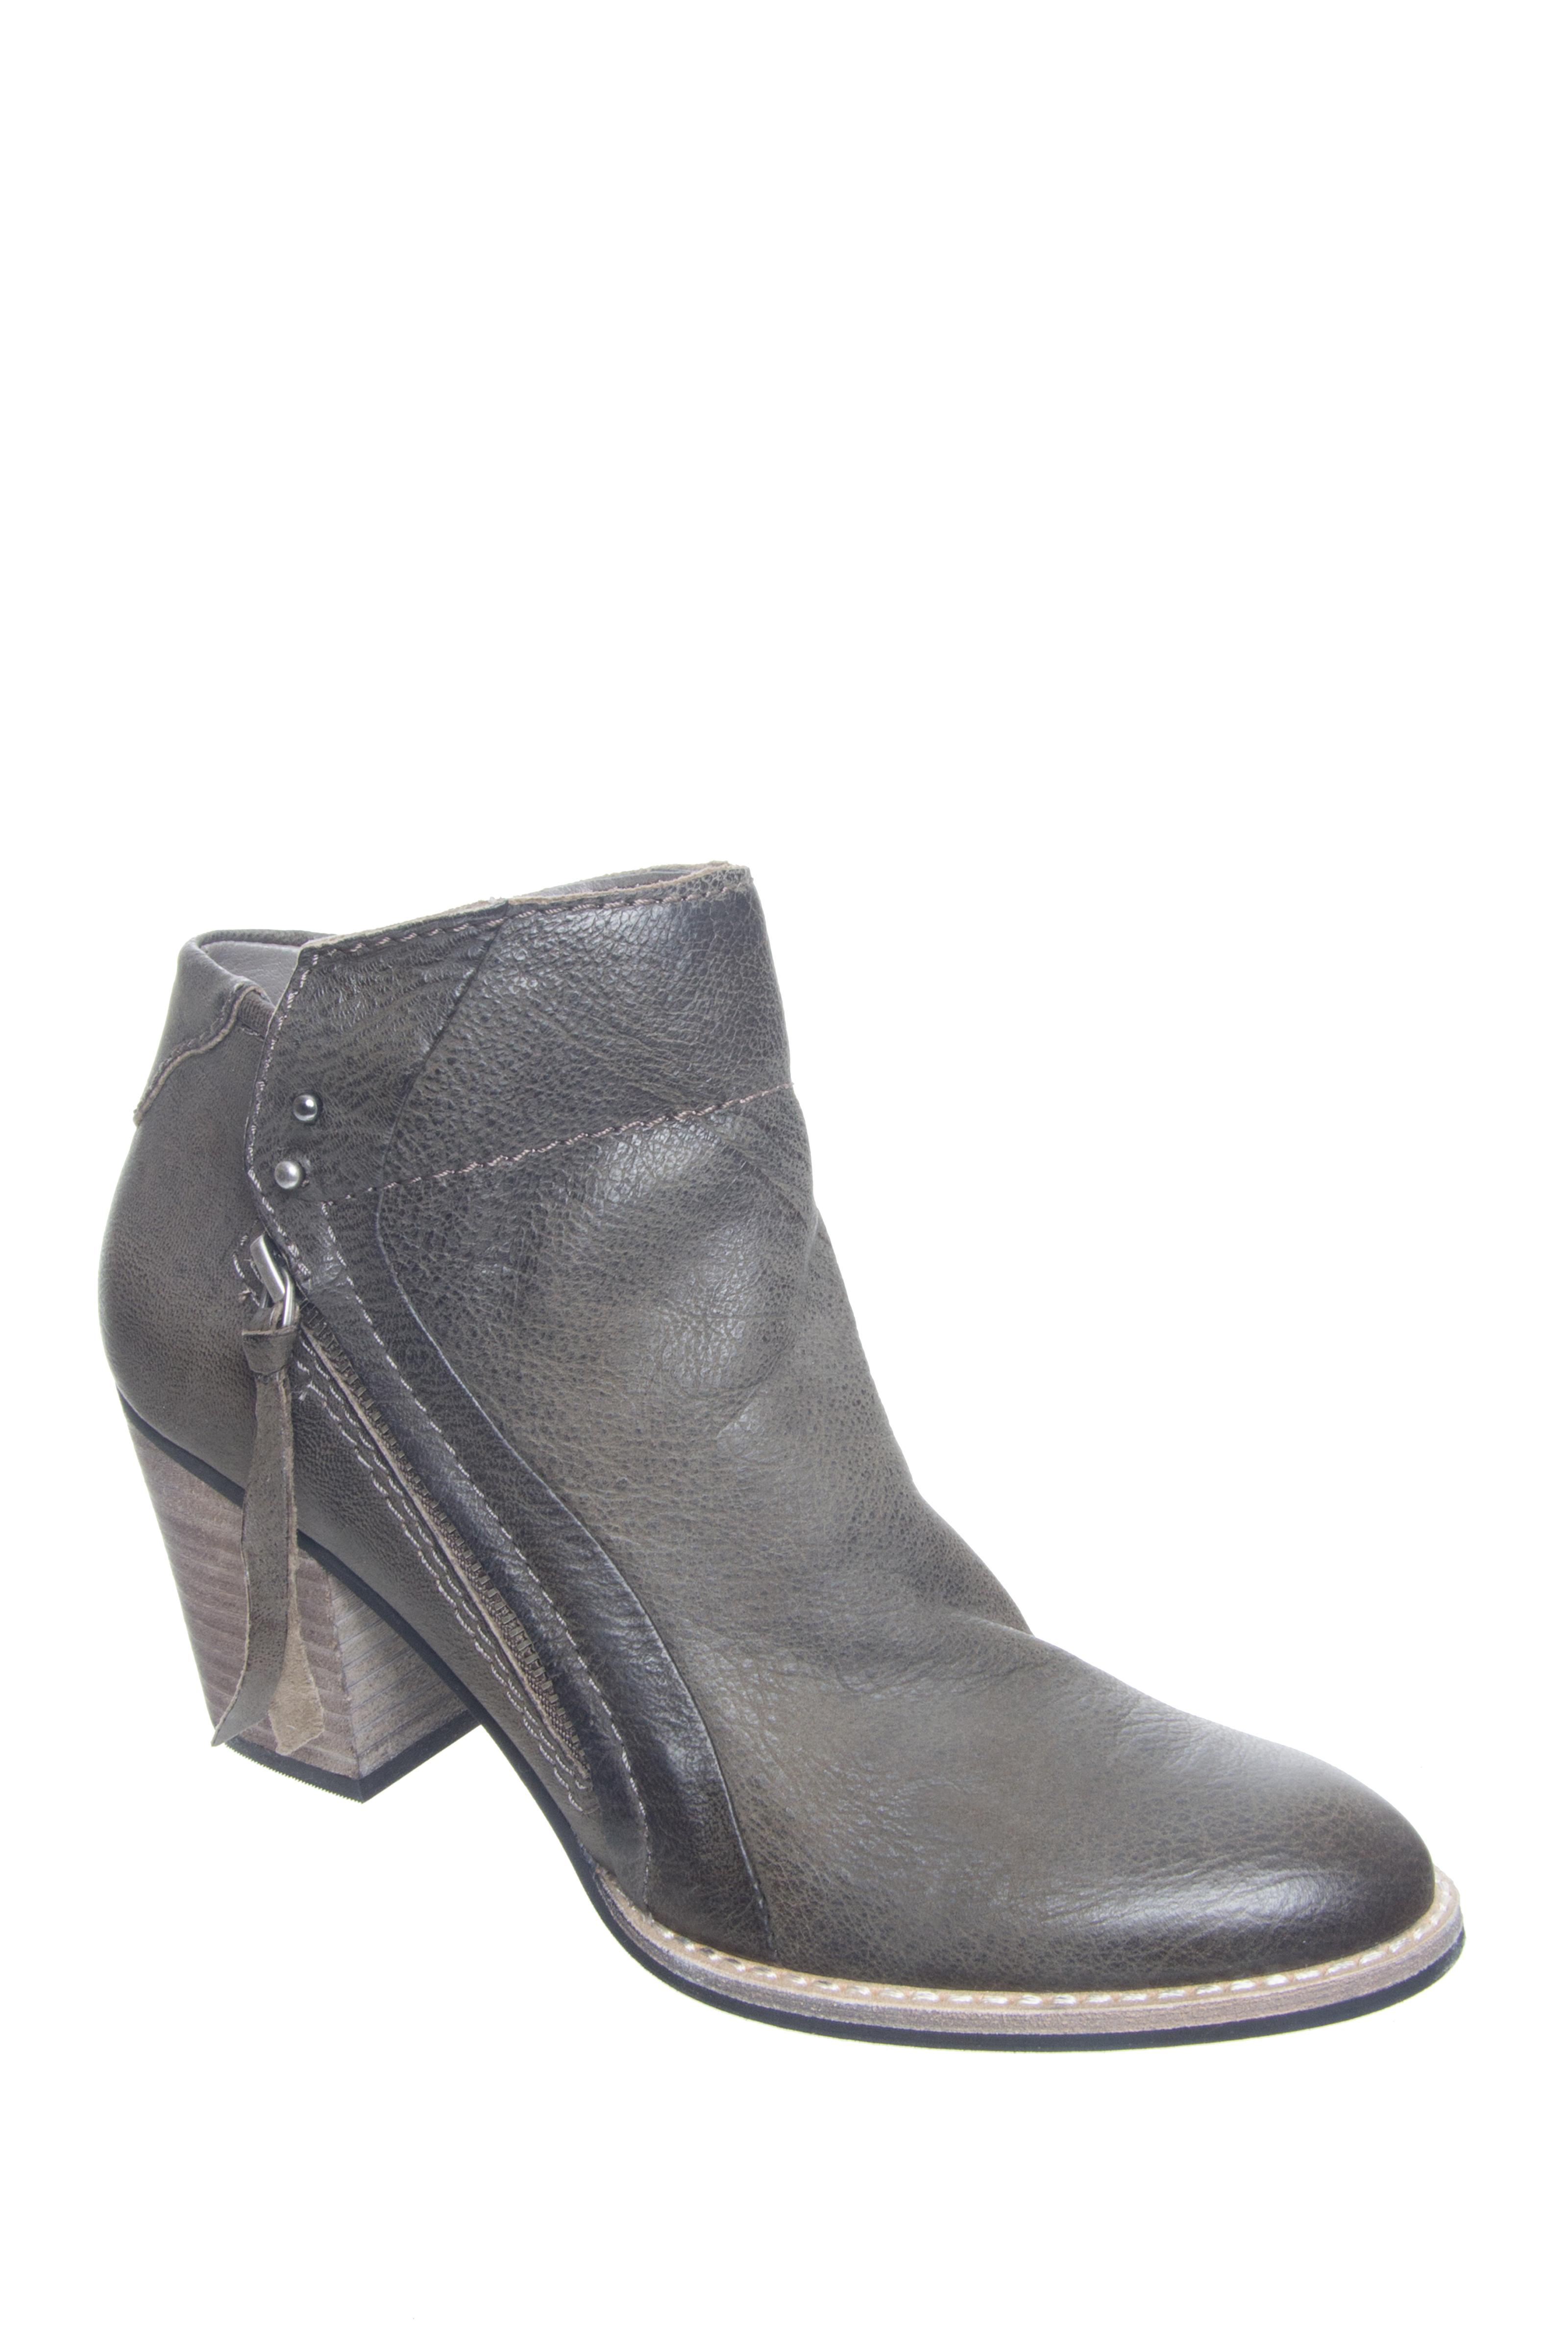 Dolce Vita Jessie Side Zip Booties - Charcoal